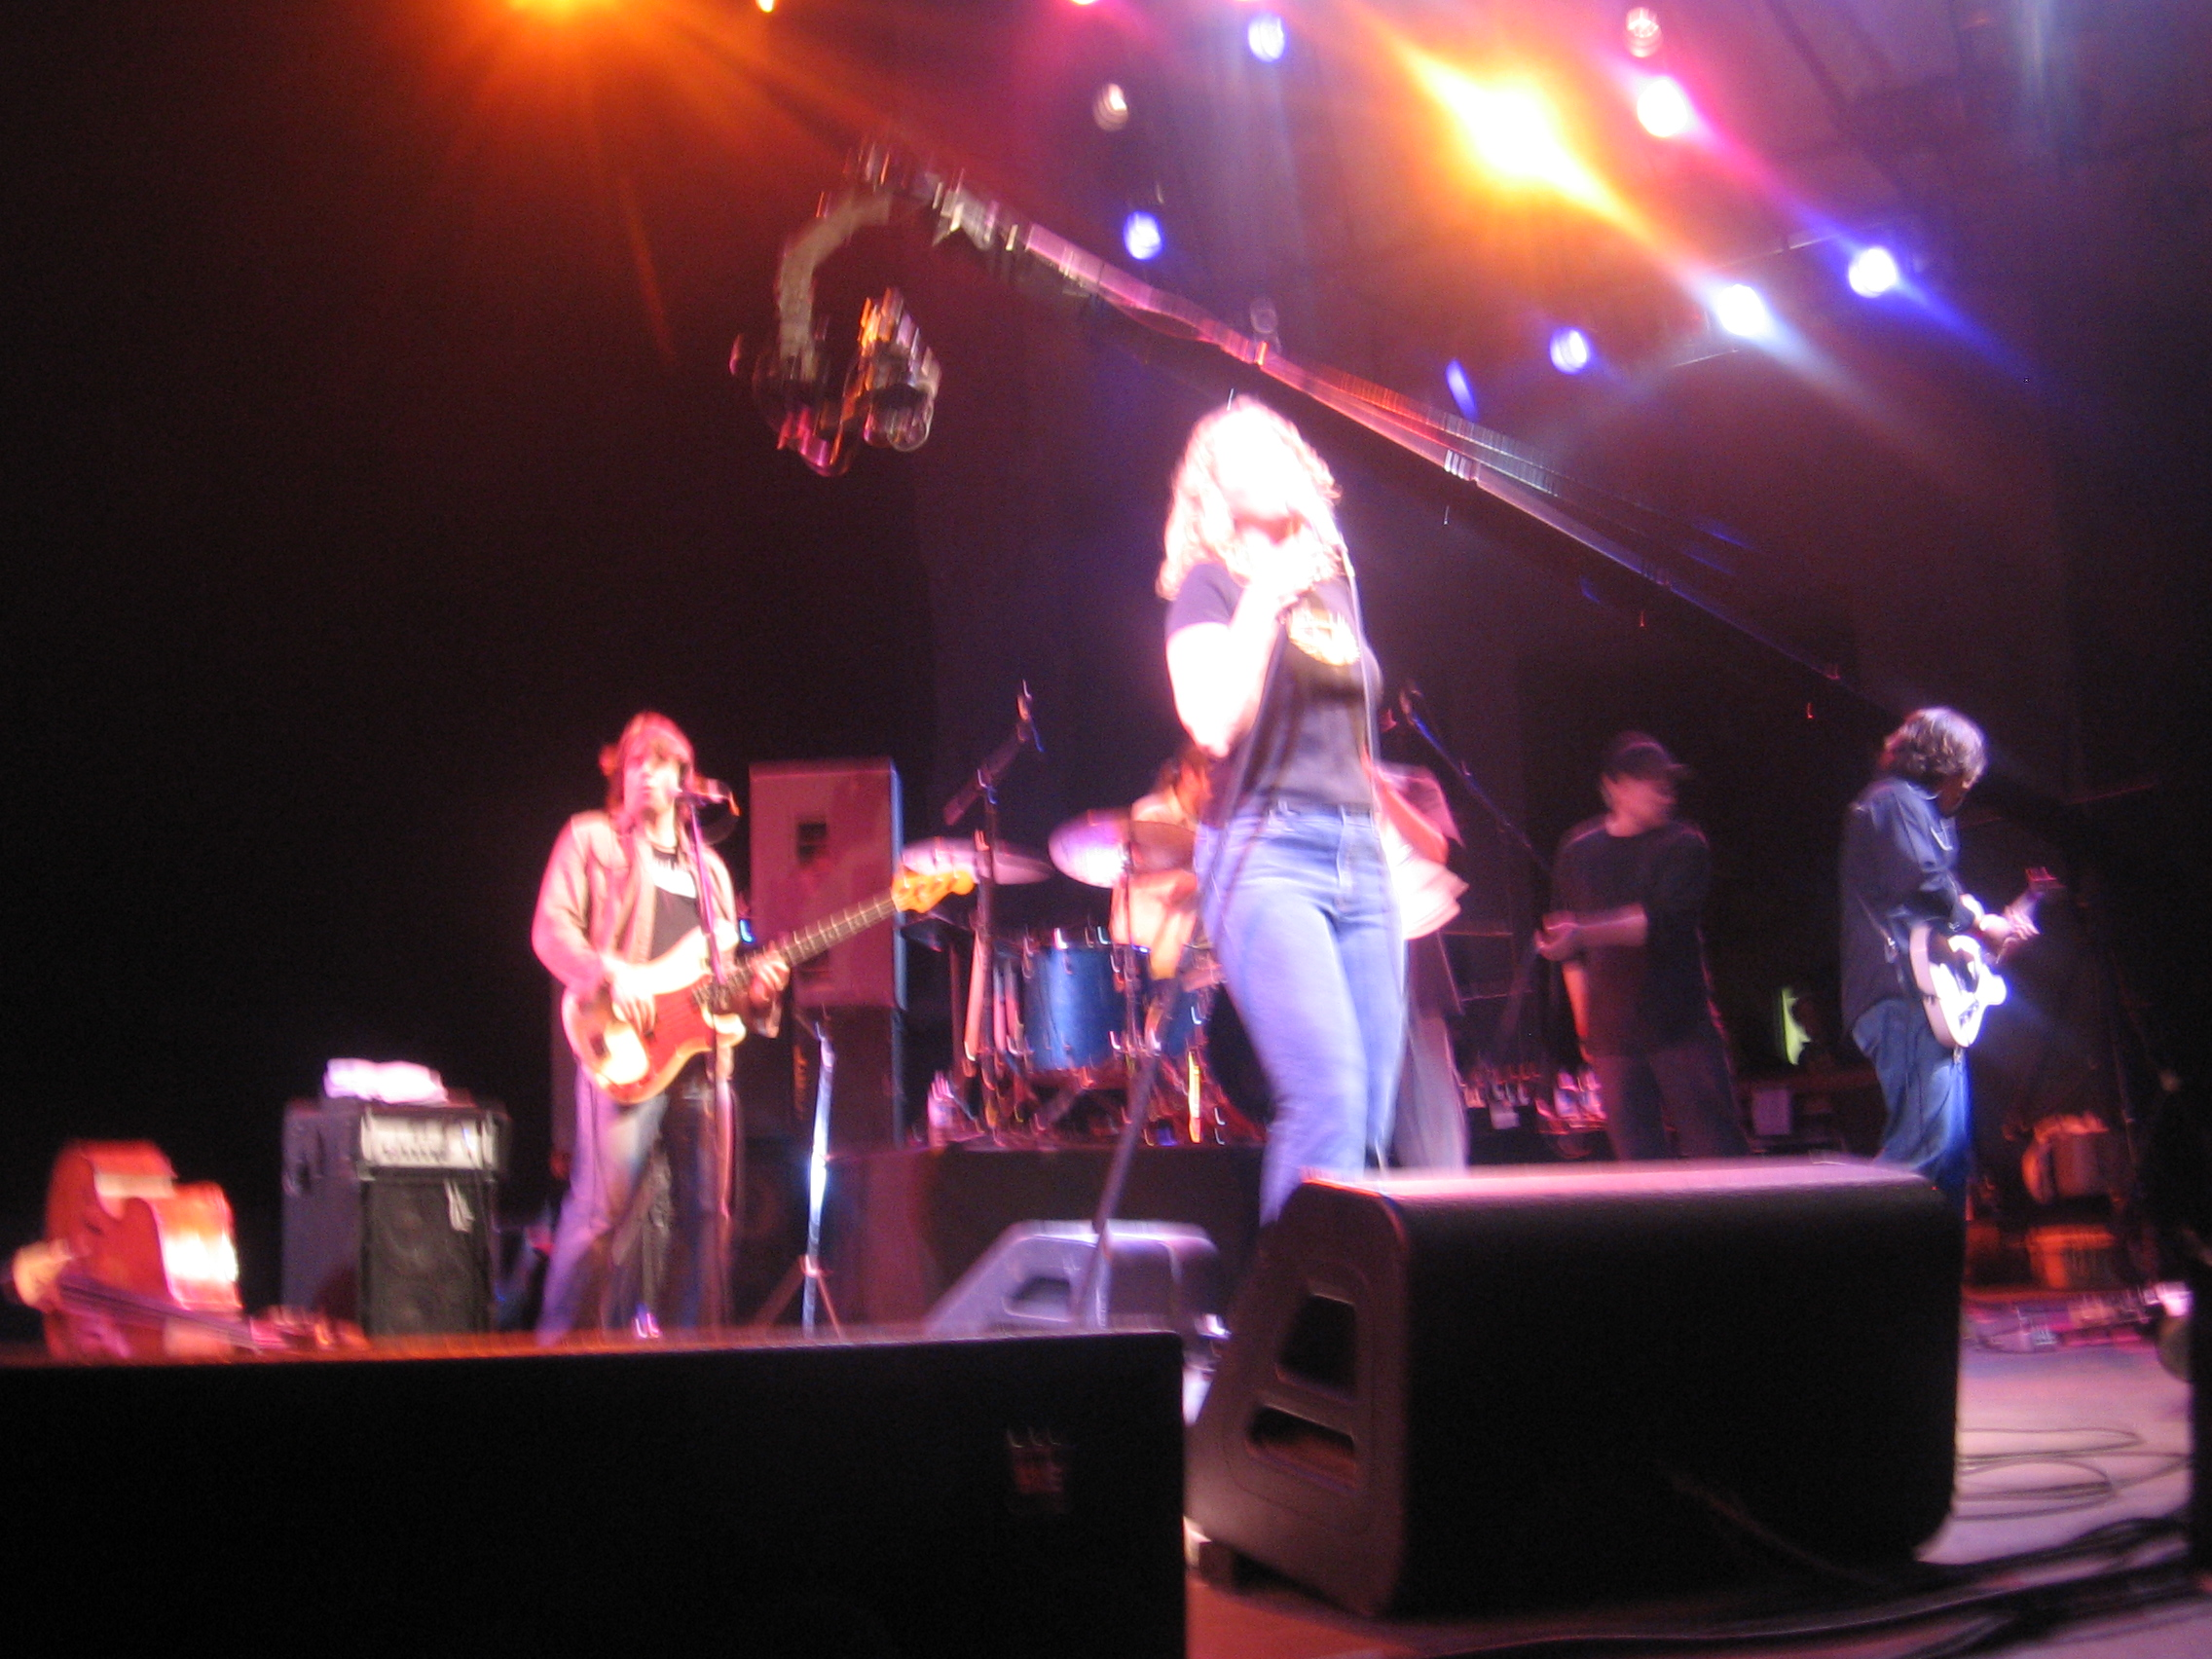 jimmy jib at concert